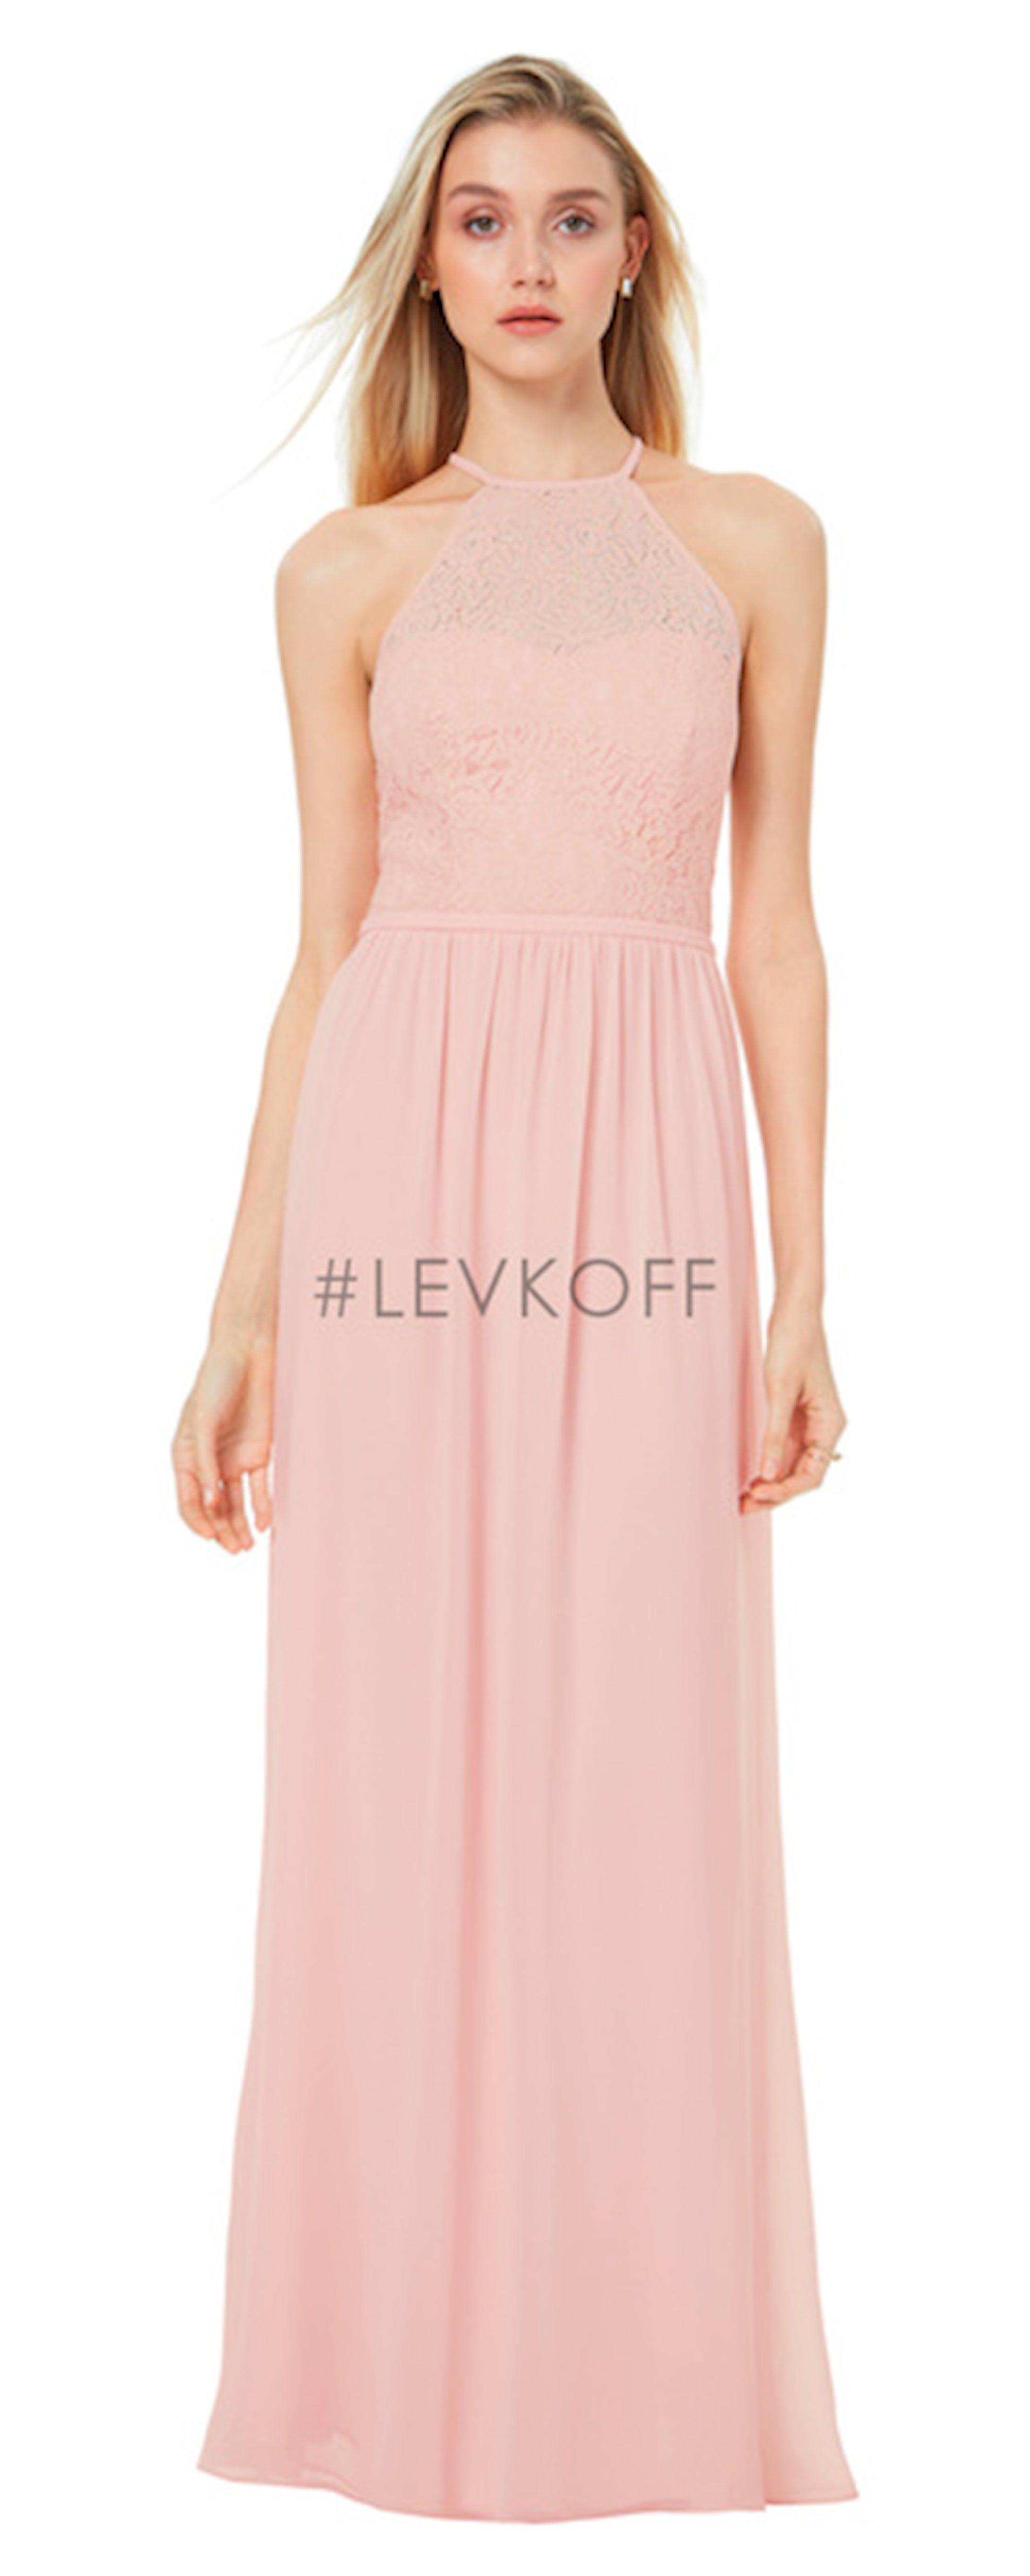 66e05b741d17 Bill Levkoff Bridesmaids Dresses   RashawnRose Bridesmaids Dresses ...